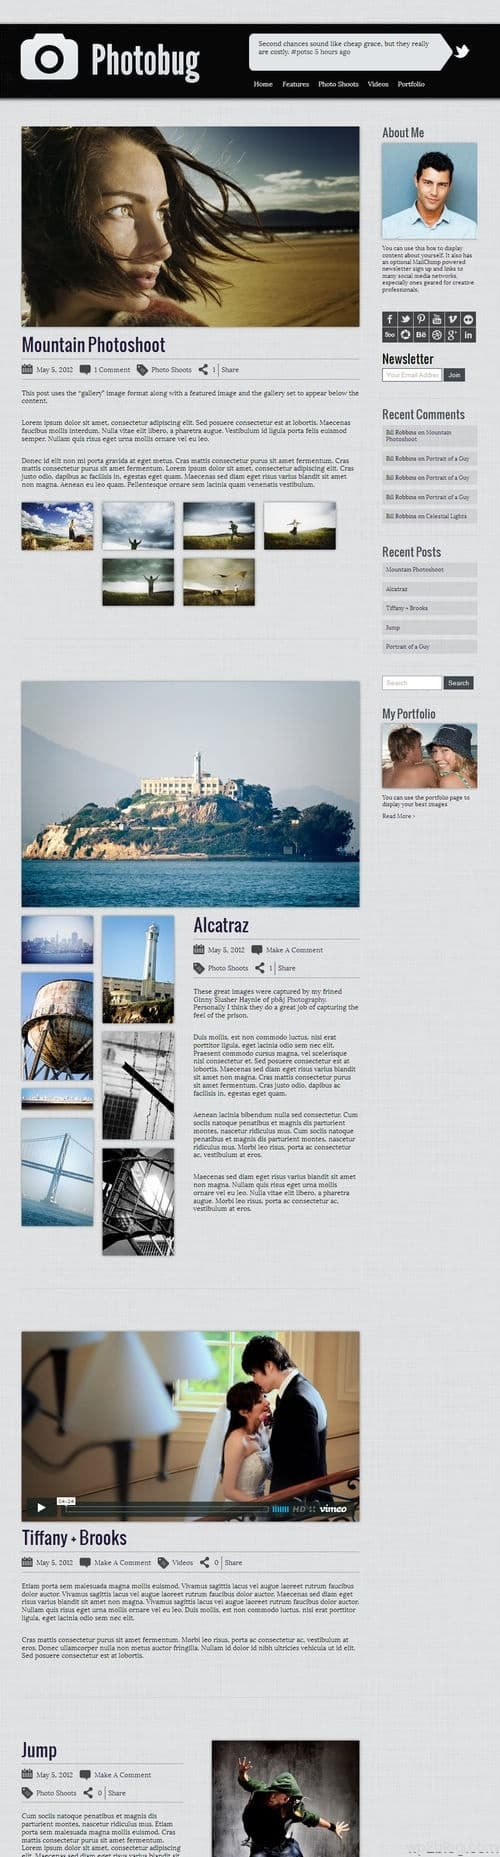 Photobug WordPress Theme